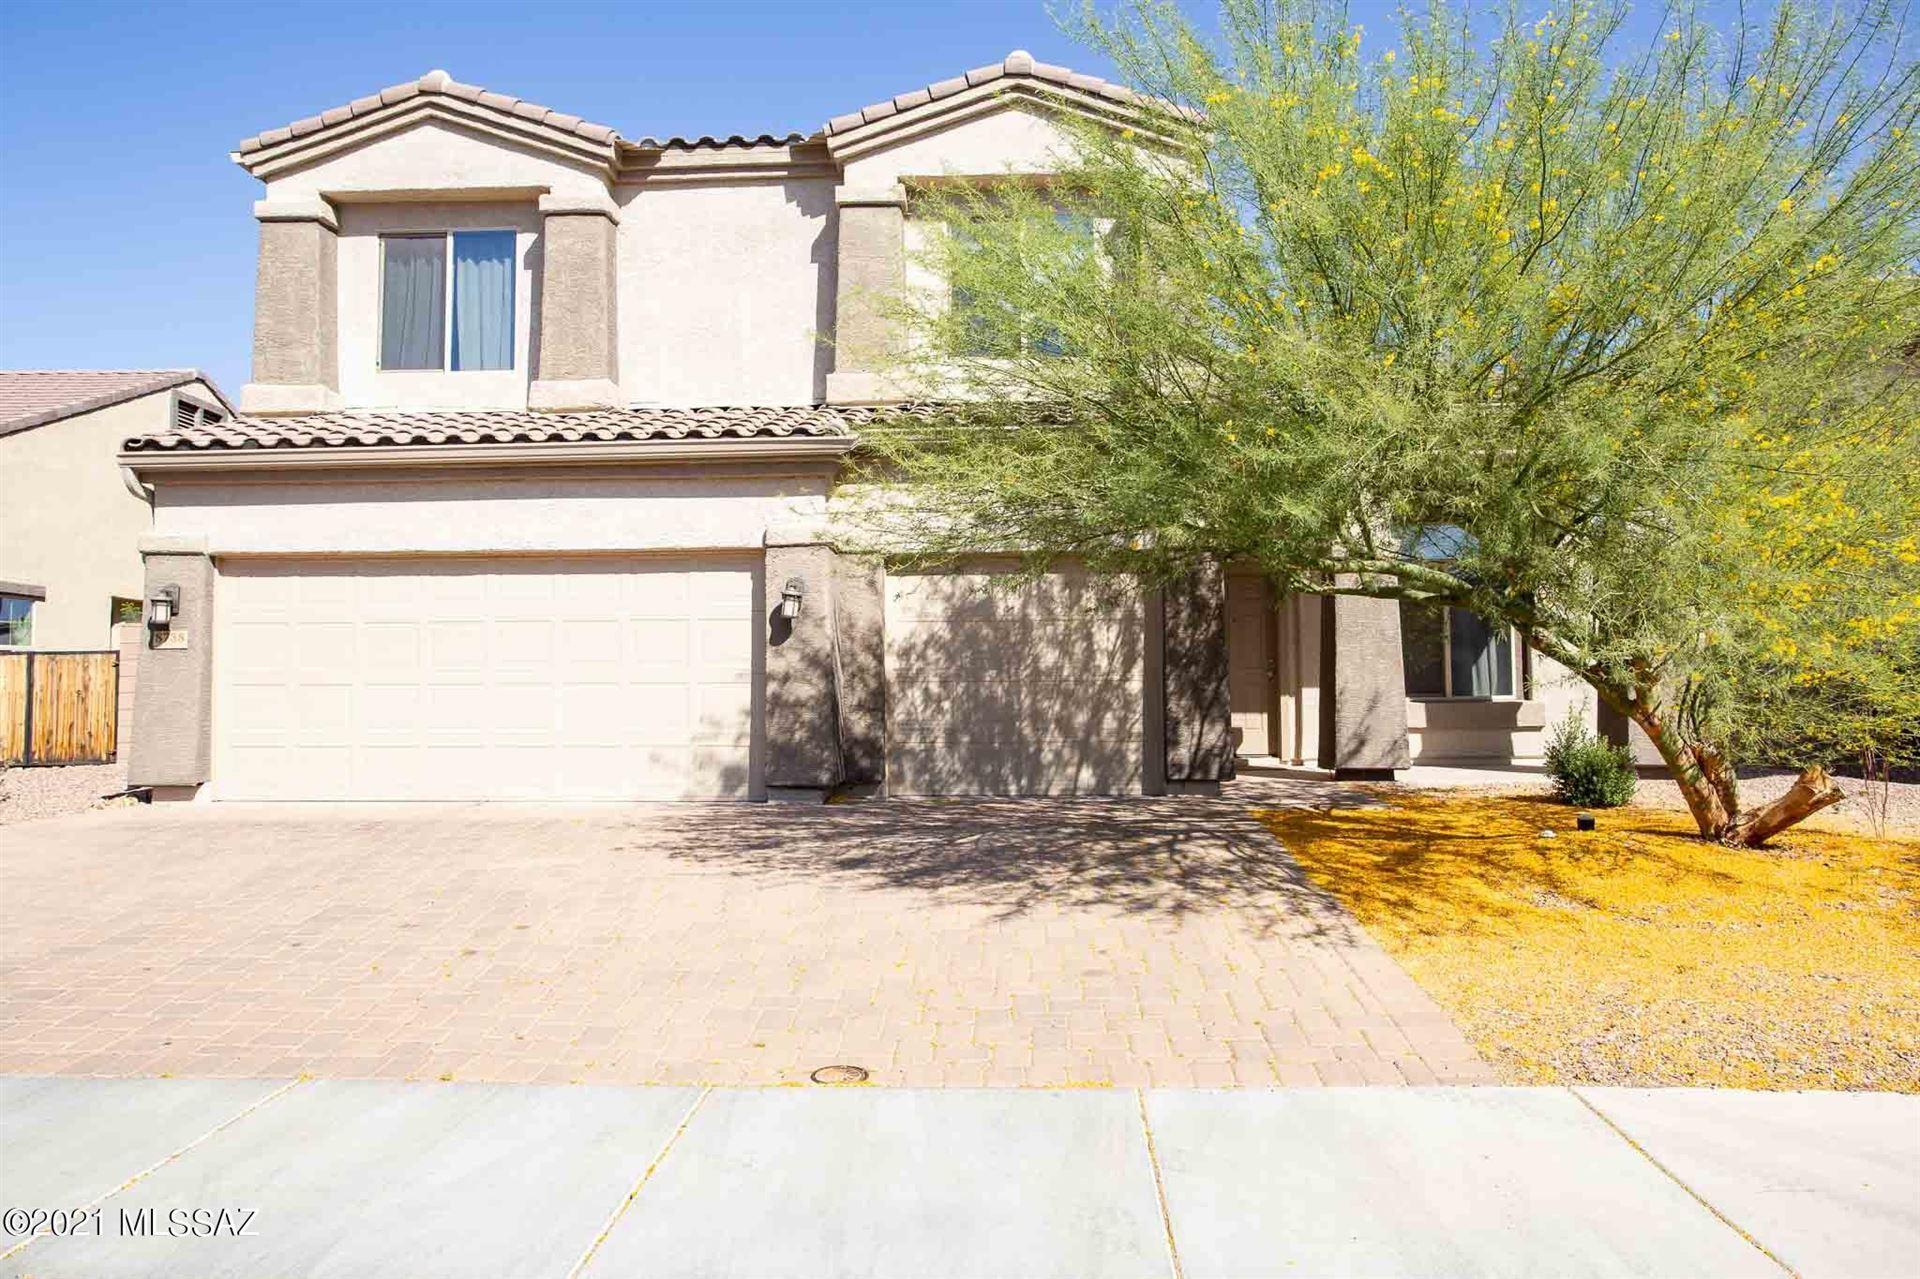 8738 W Denstone Road, Marana, AZ 85653 - MLS#: 22111937